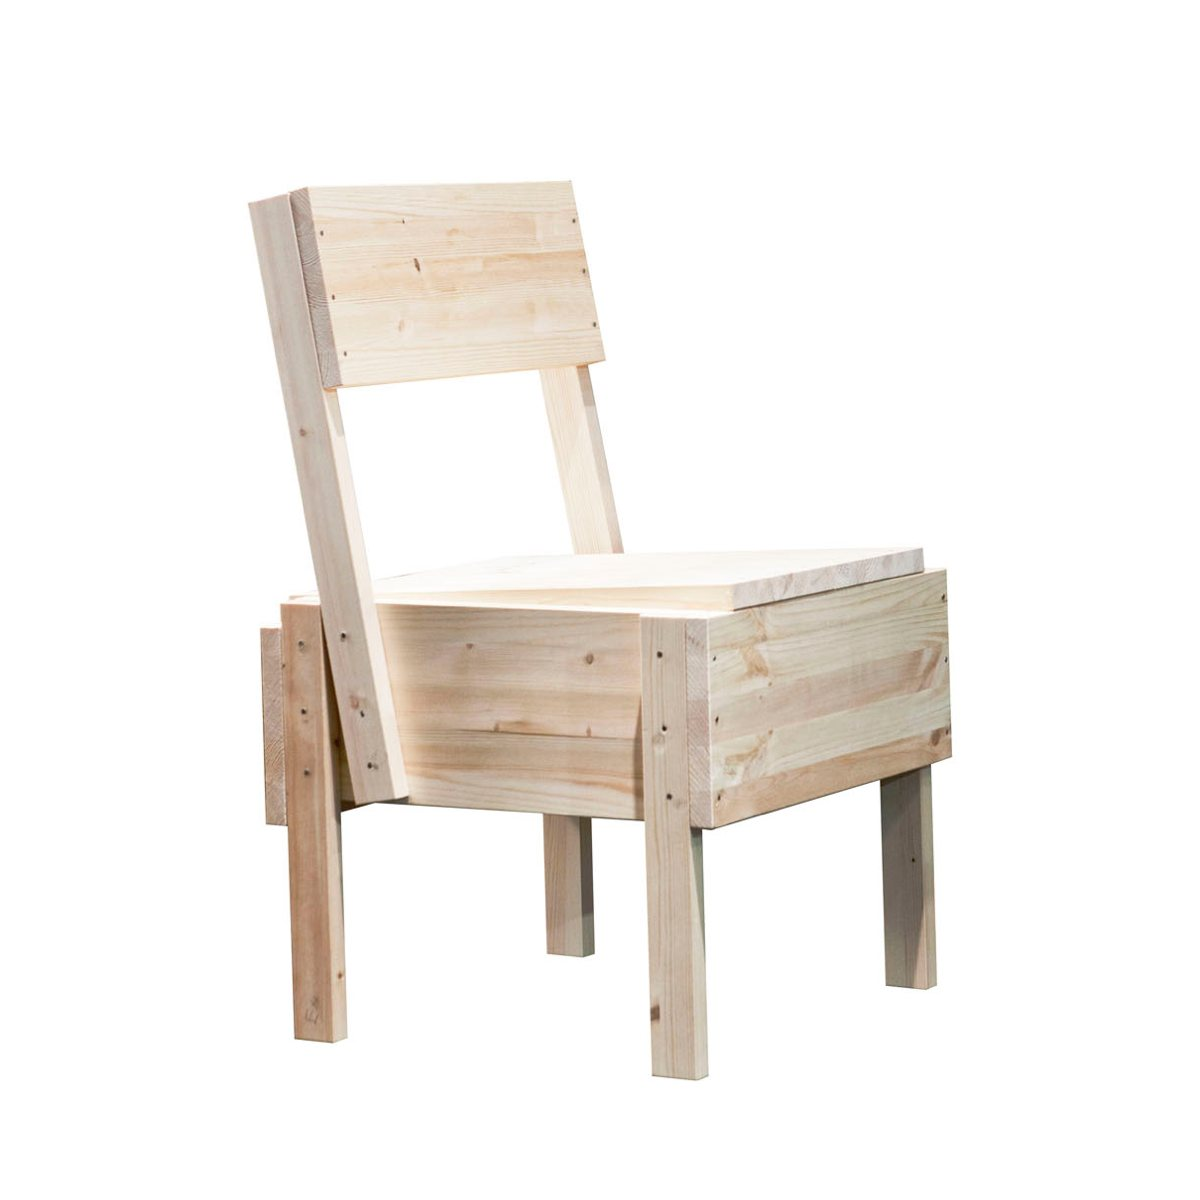 sedia 1 chair by enzo mari for artek